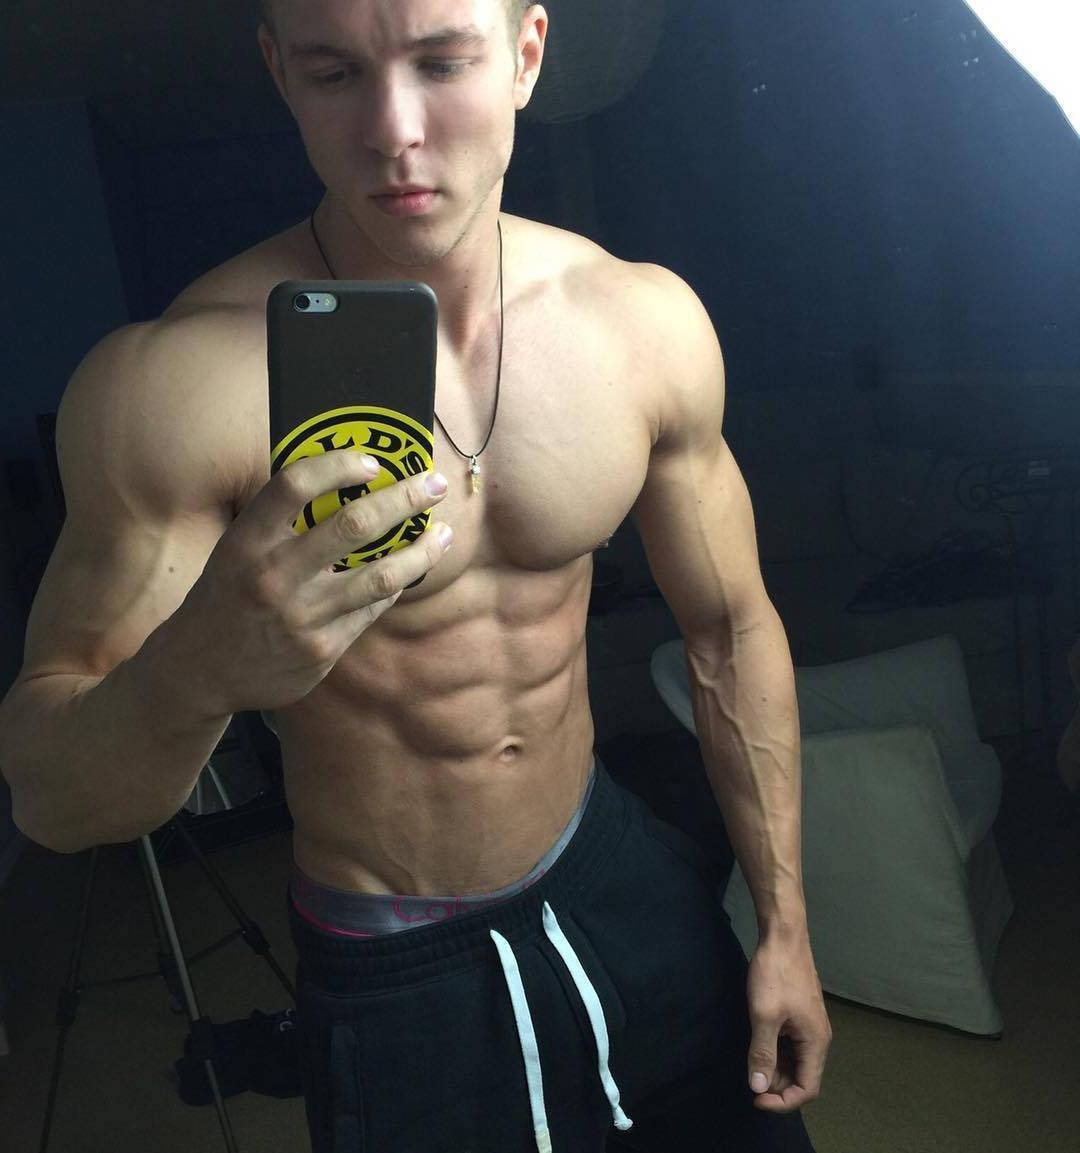 sexy-shirtless-joe-dahler-ripped-sixpack-abs-selfies